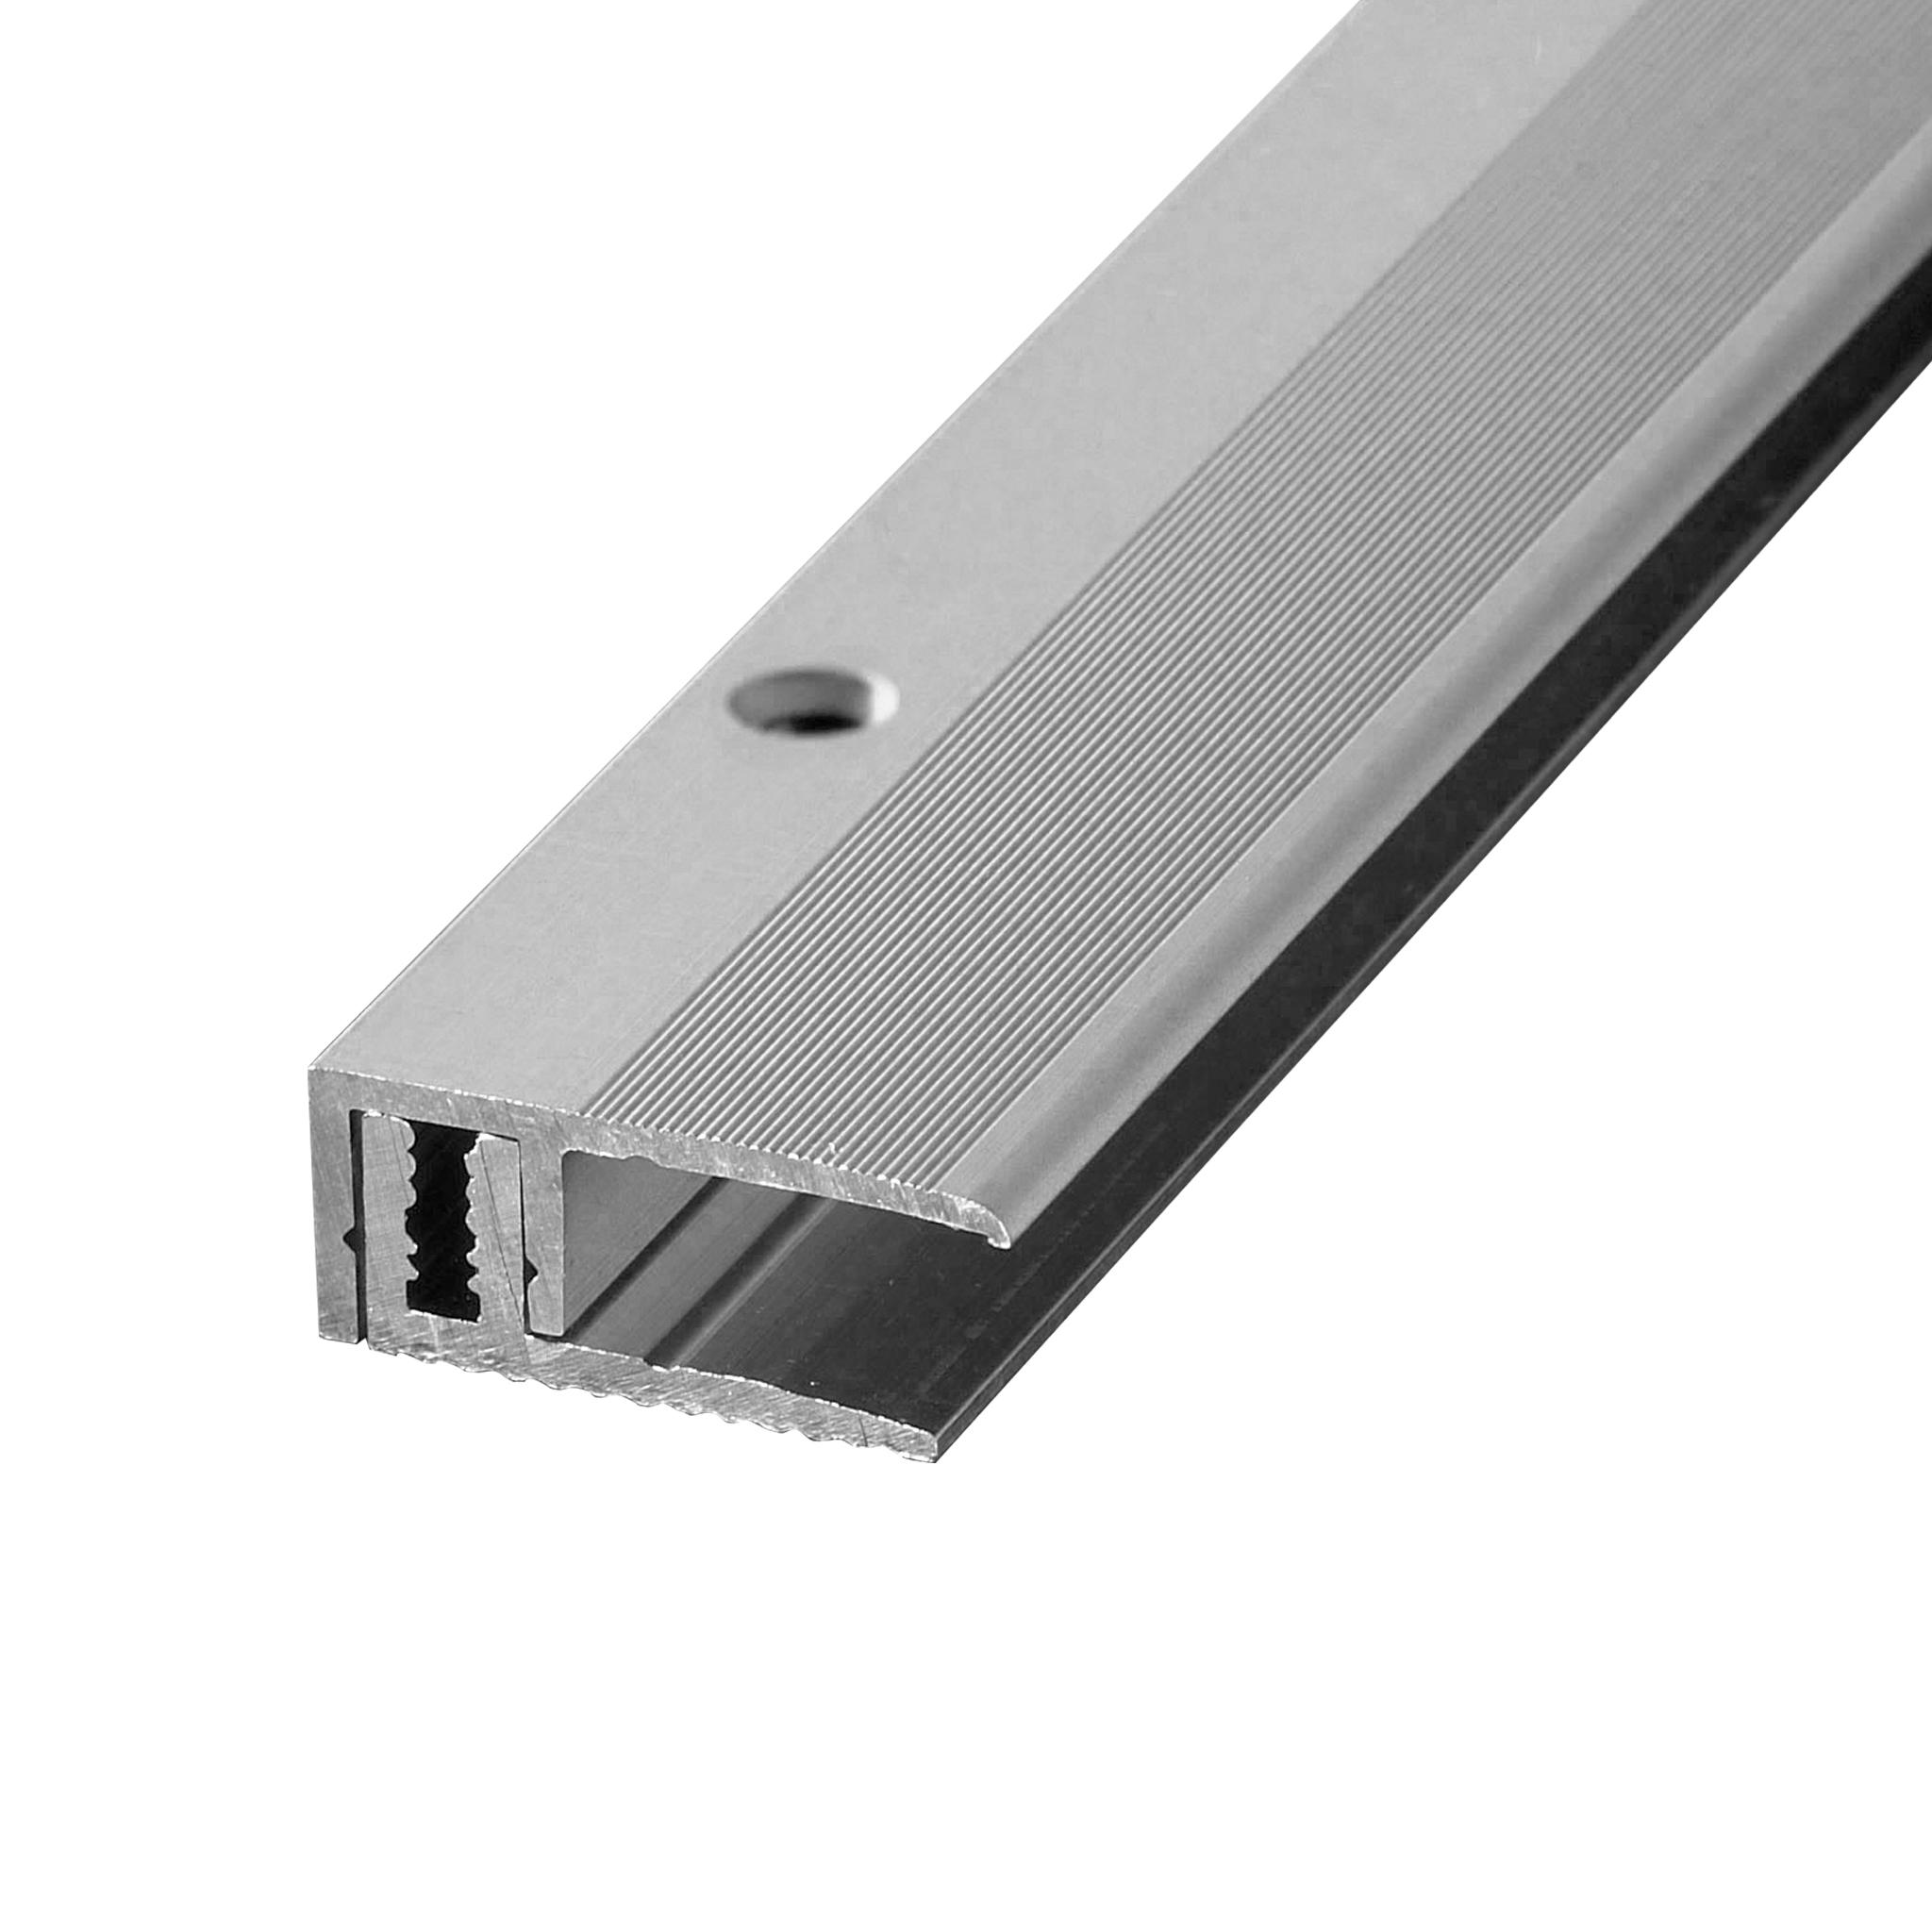 End profile aluminium stainless steel 1m